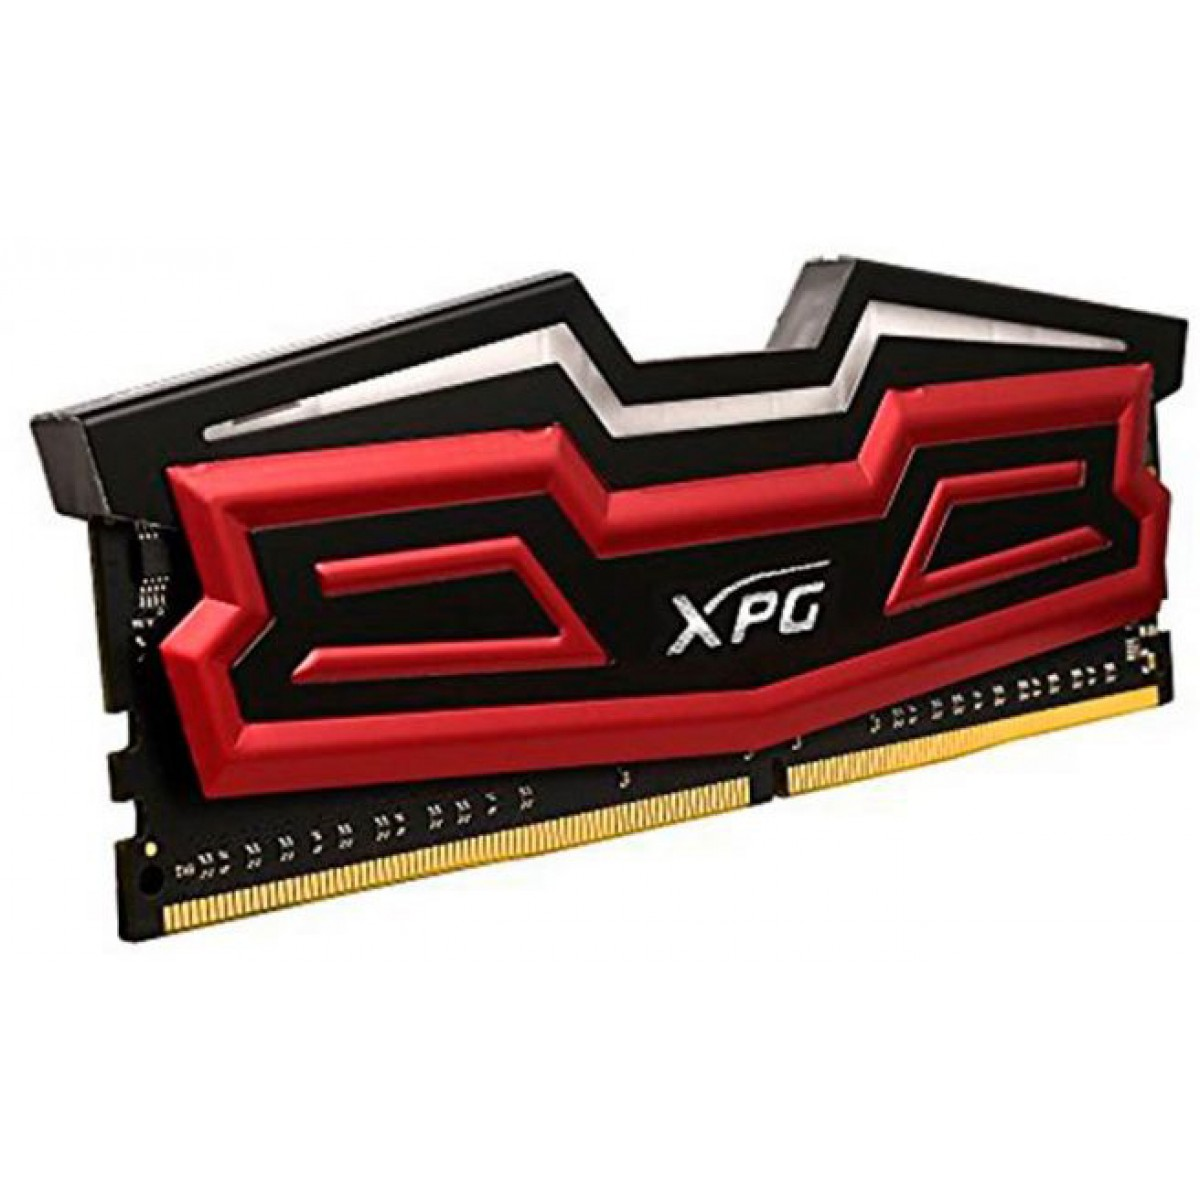 Memória DDR4 XPG Dazzle, 8GB 2400MHz, Red LED, AX4U2400W8G16-SRD